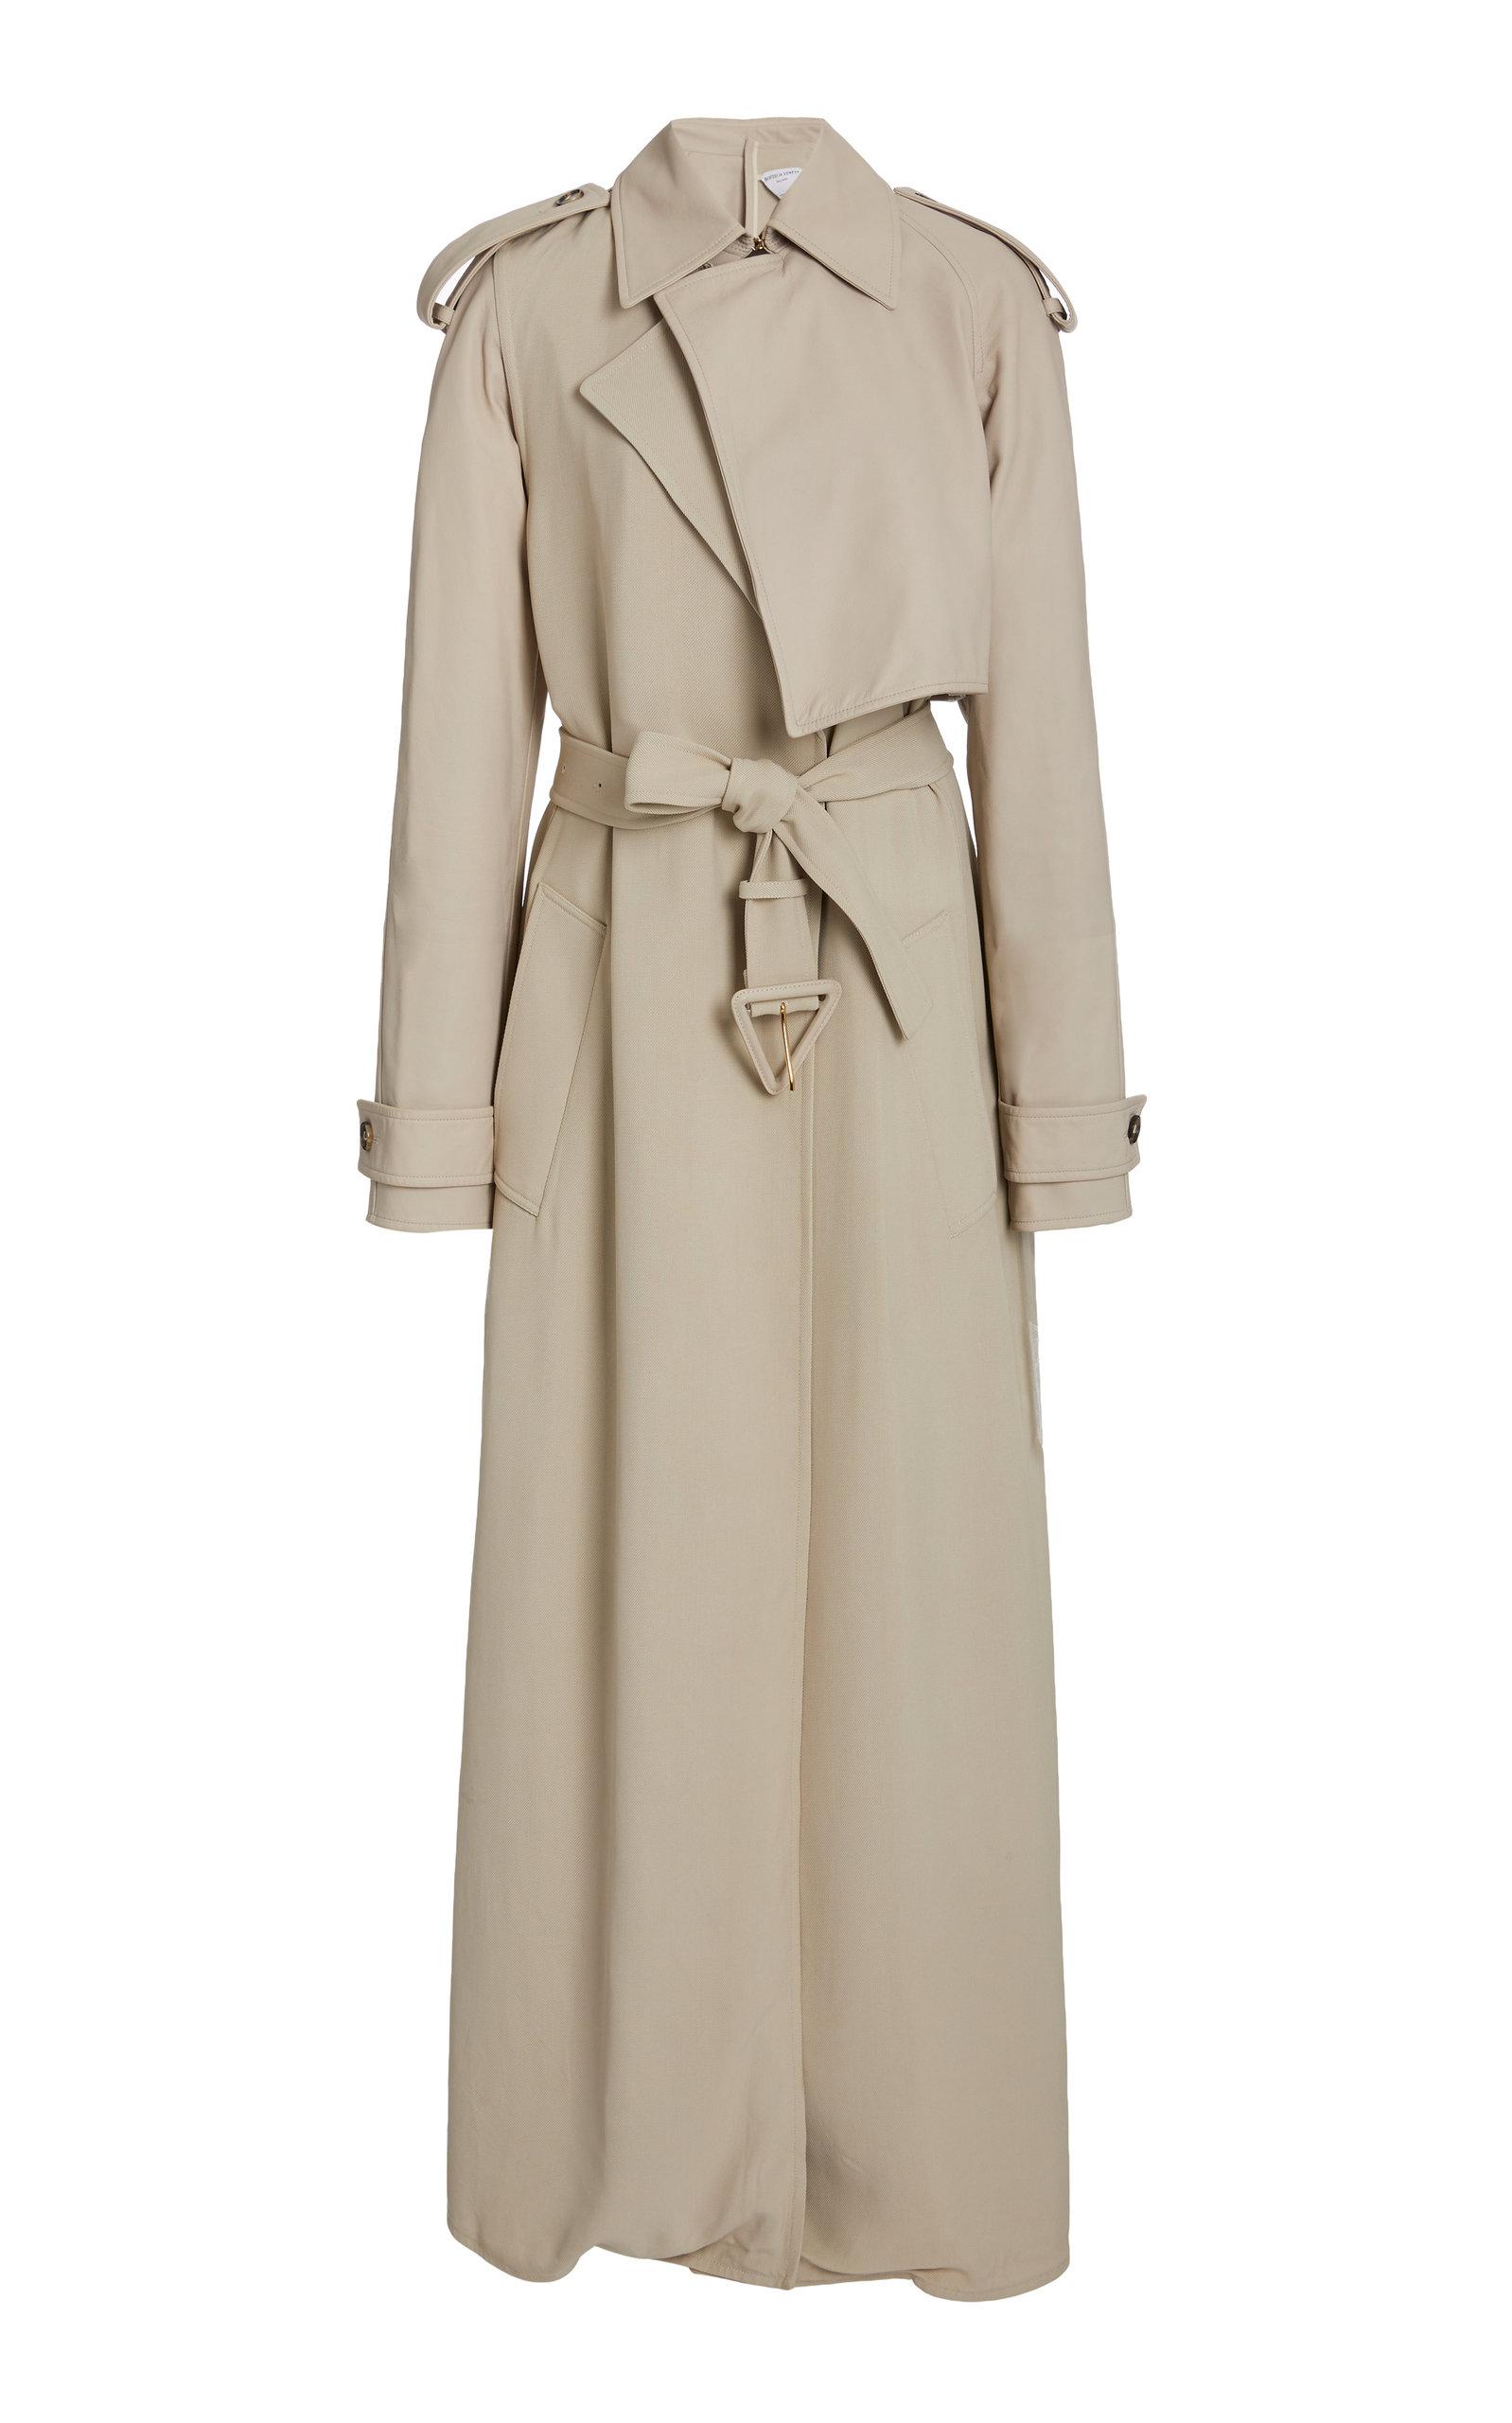 Bottega Veneta - Women's Long Belted Twill Trench Coat - Neutral - Moda Operandi